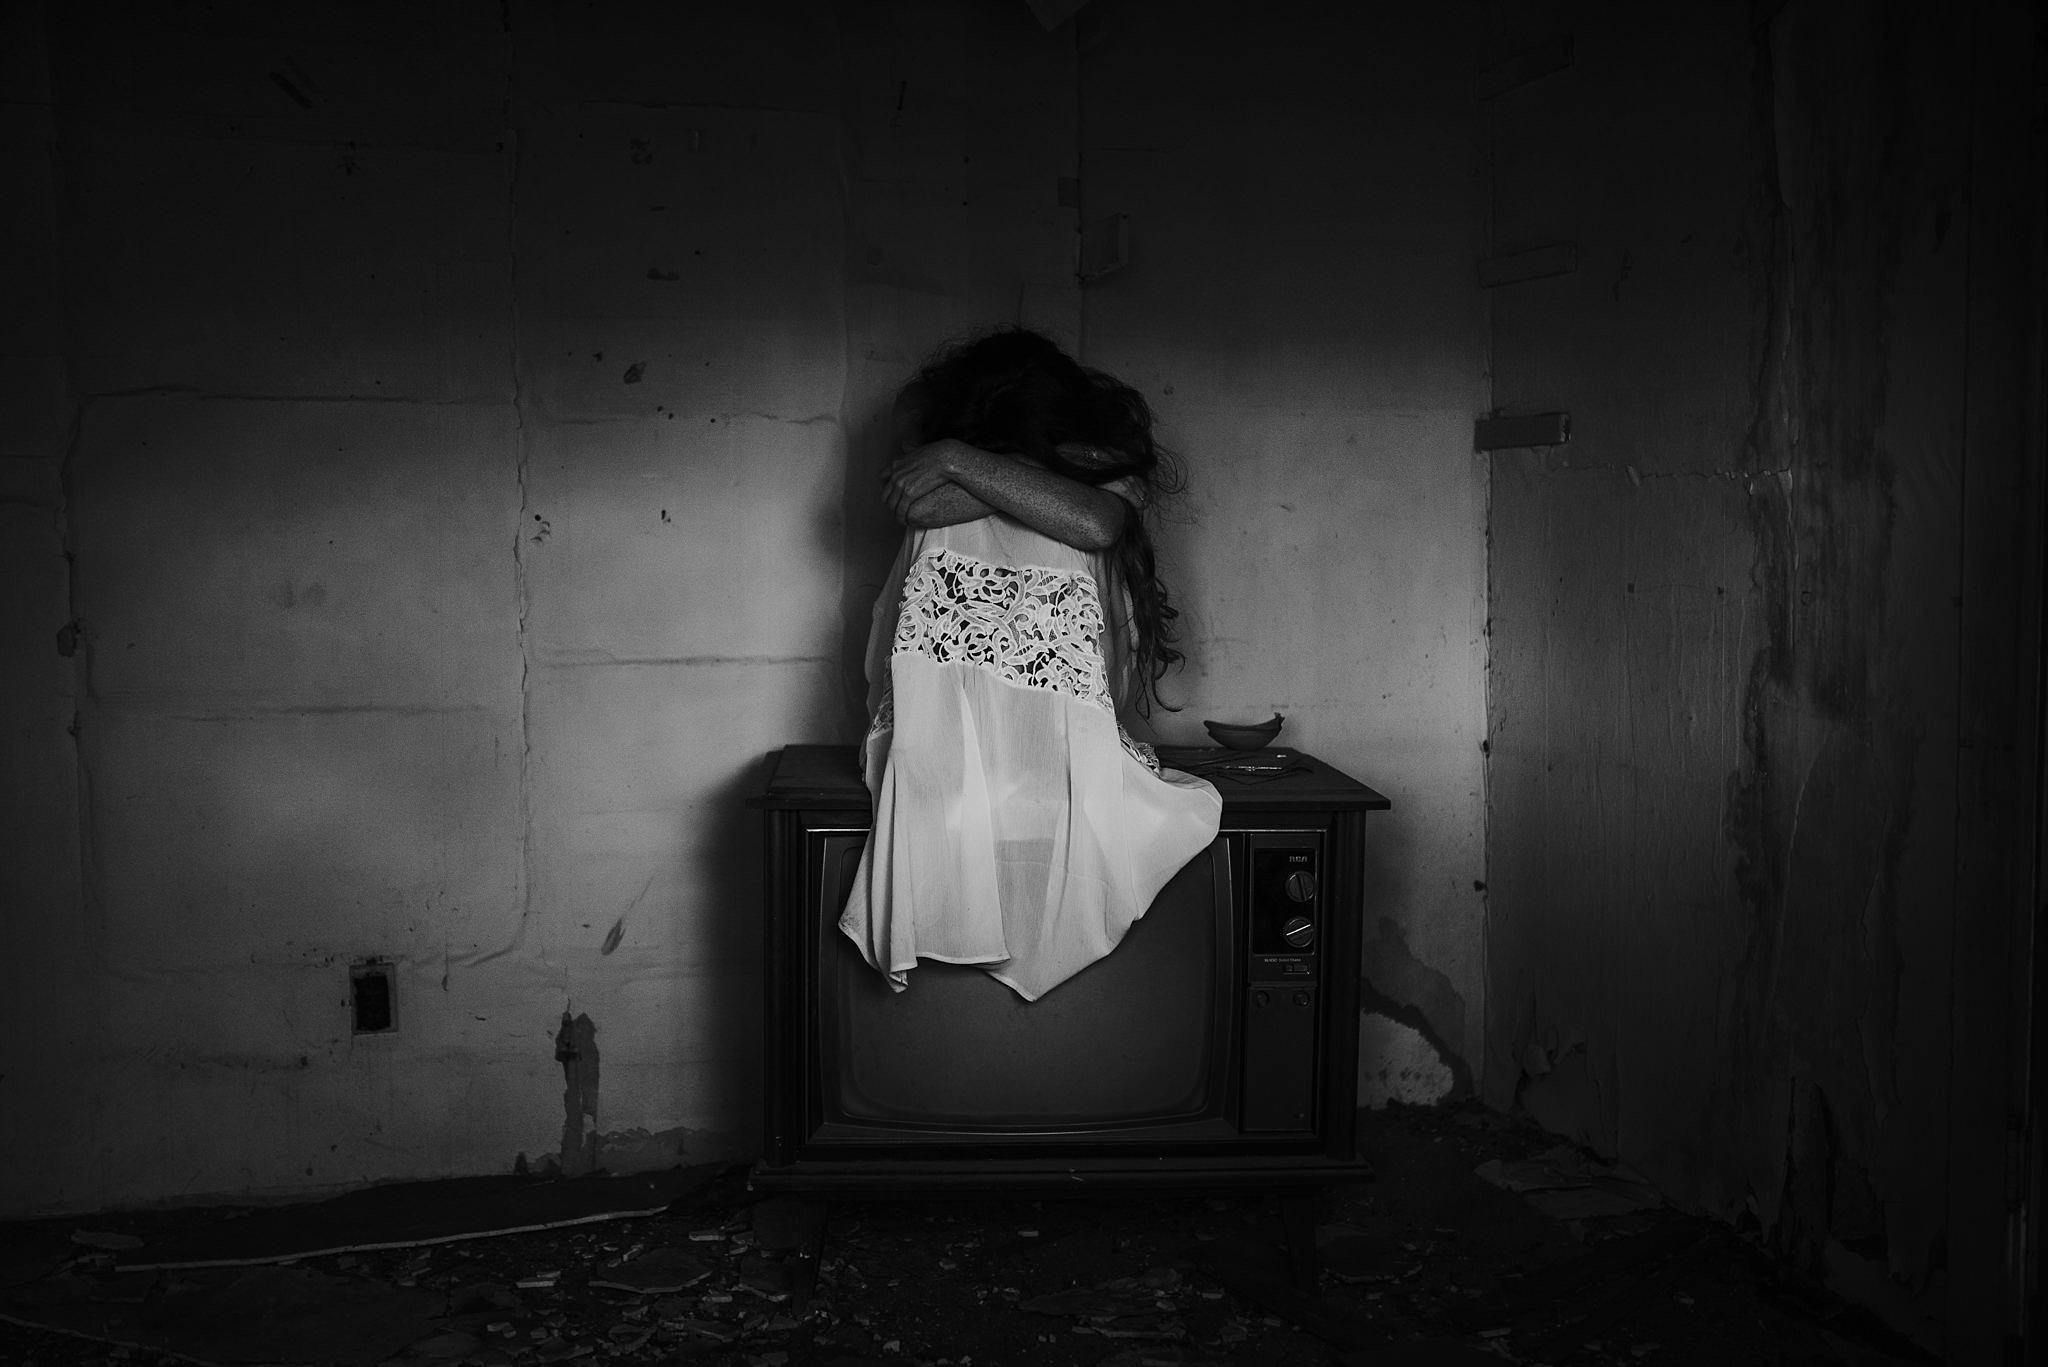 twyla jones photography - west palm beach florida photographer - boudoir in an old house-5105_treasure coast florida.jpg